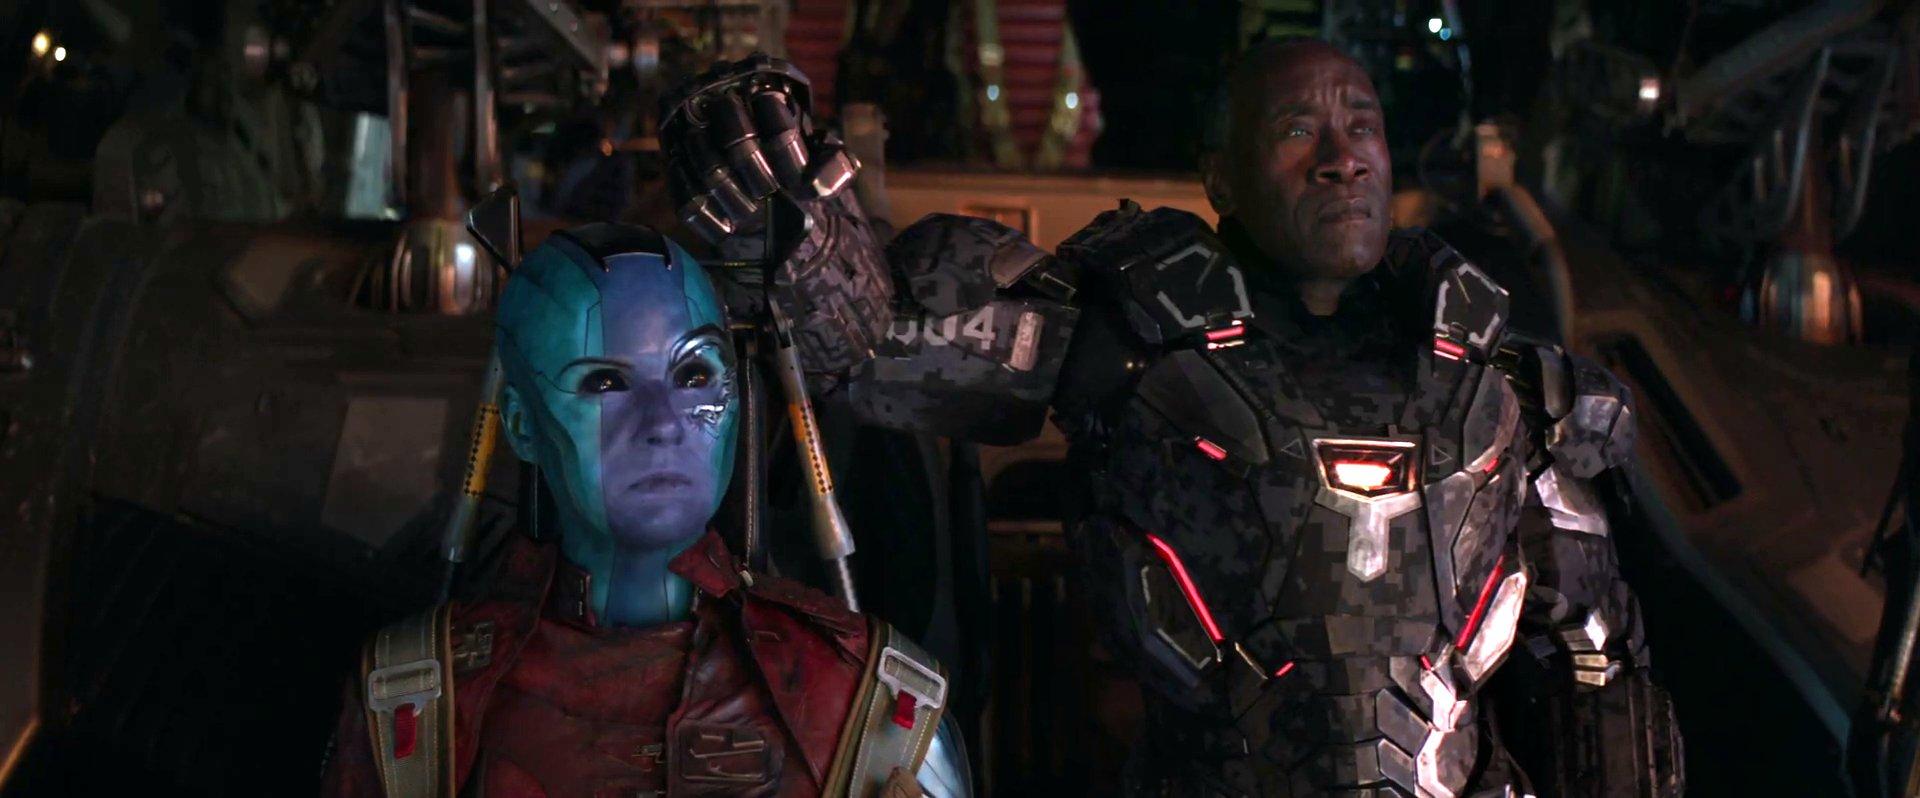 Nebula and War Machine in a scene from Avengers: Endgame